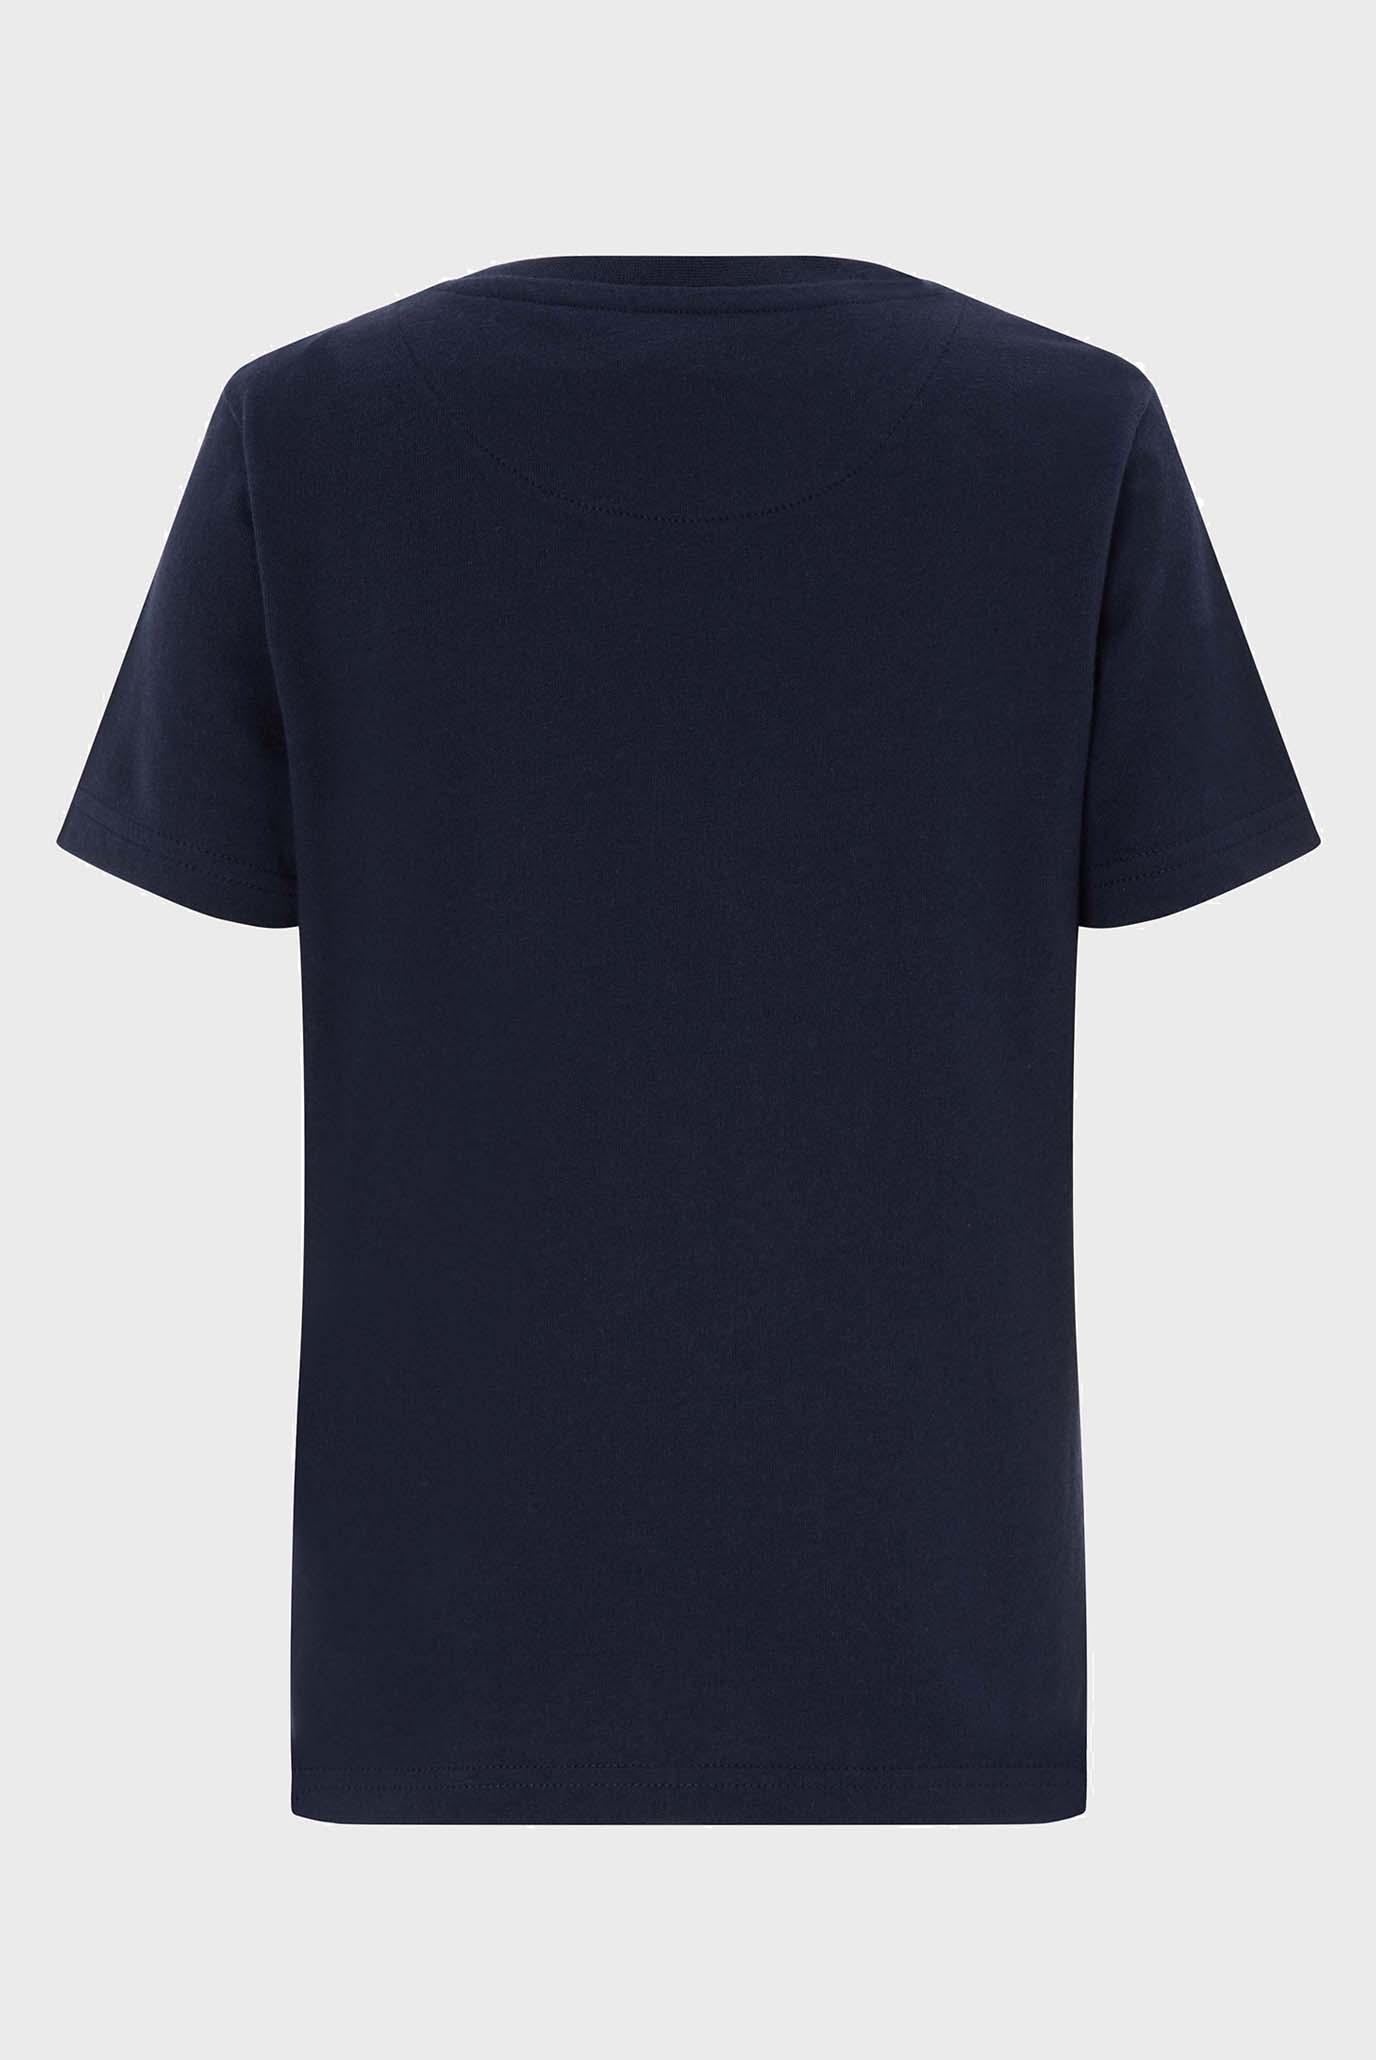 Детская синяя футболка Talon Train Tee Monsoon Children